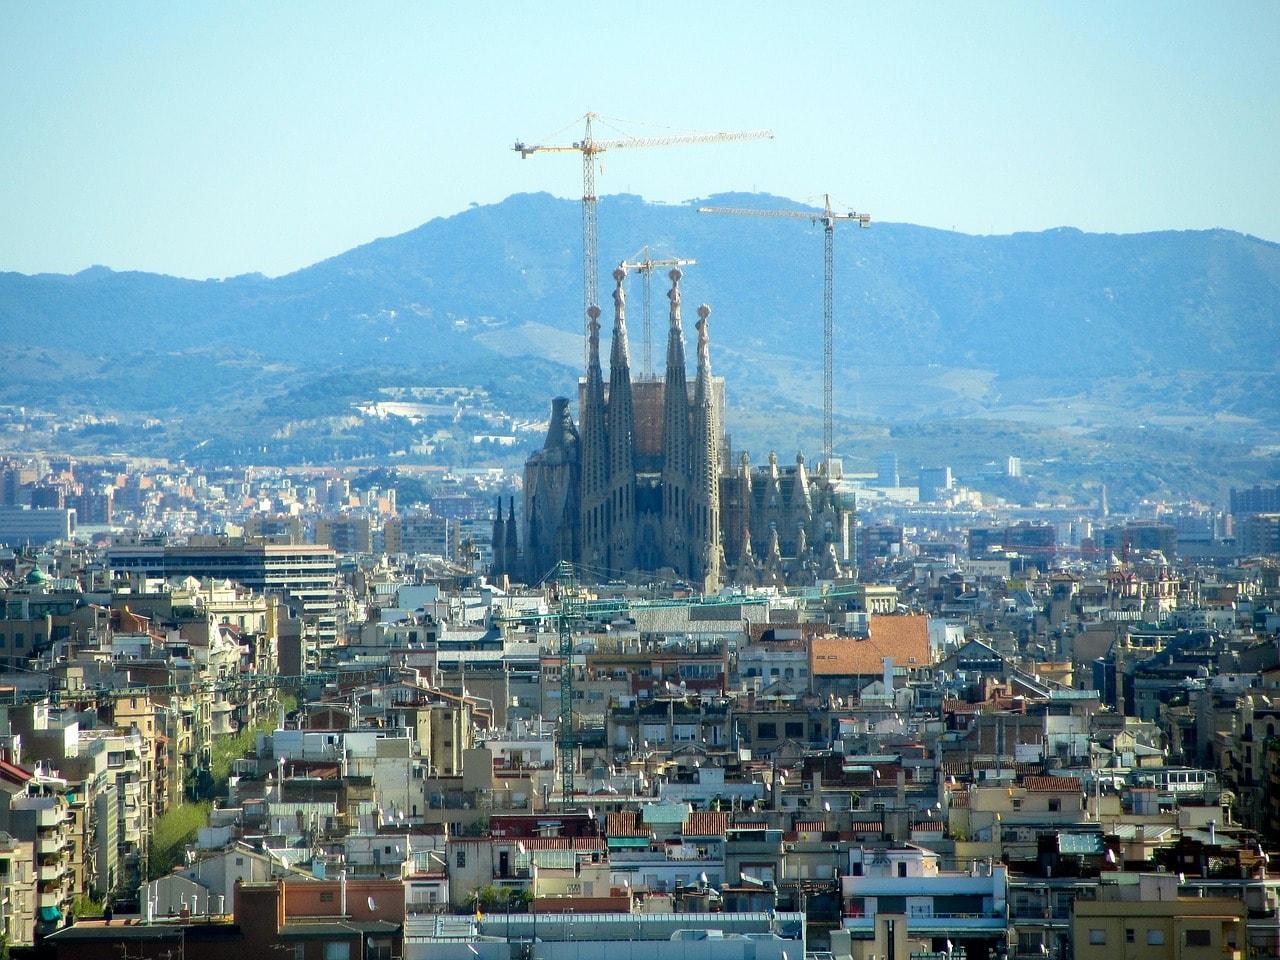 The Sagrada Família is still under construction today CC0 Pixabay